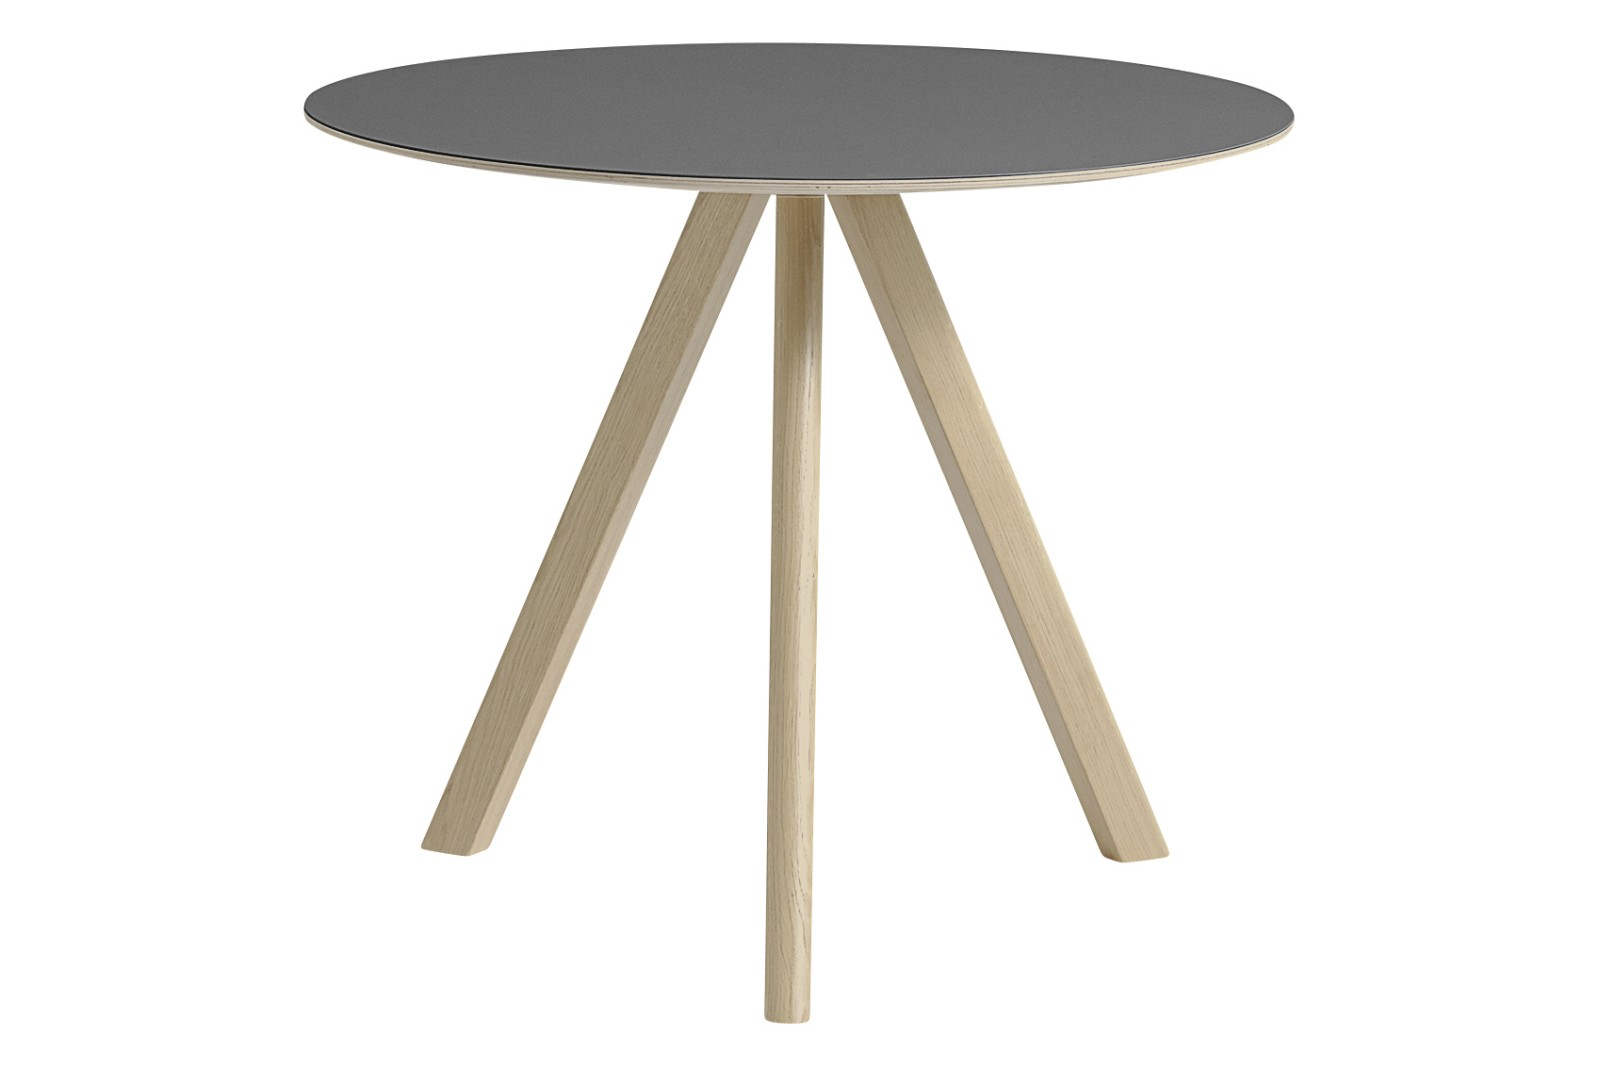 Copenhague Linoleum Top Round Dining Table CPH20 Matt Lacquered Oak Base, Grey Top, Small